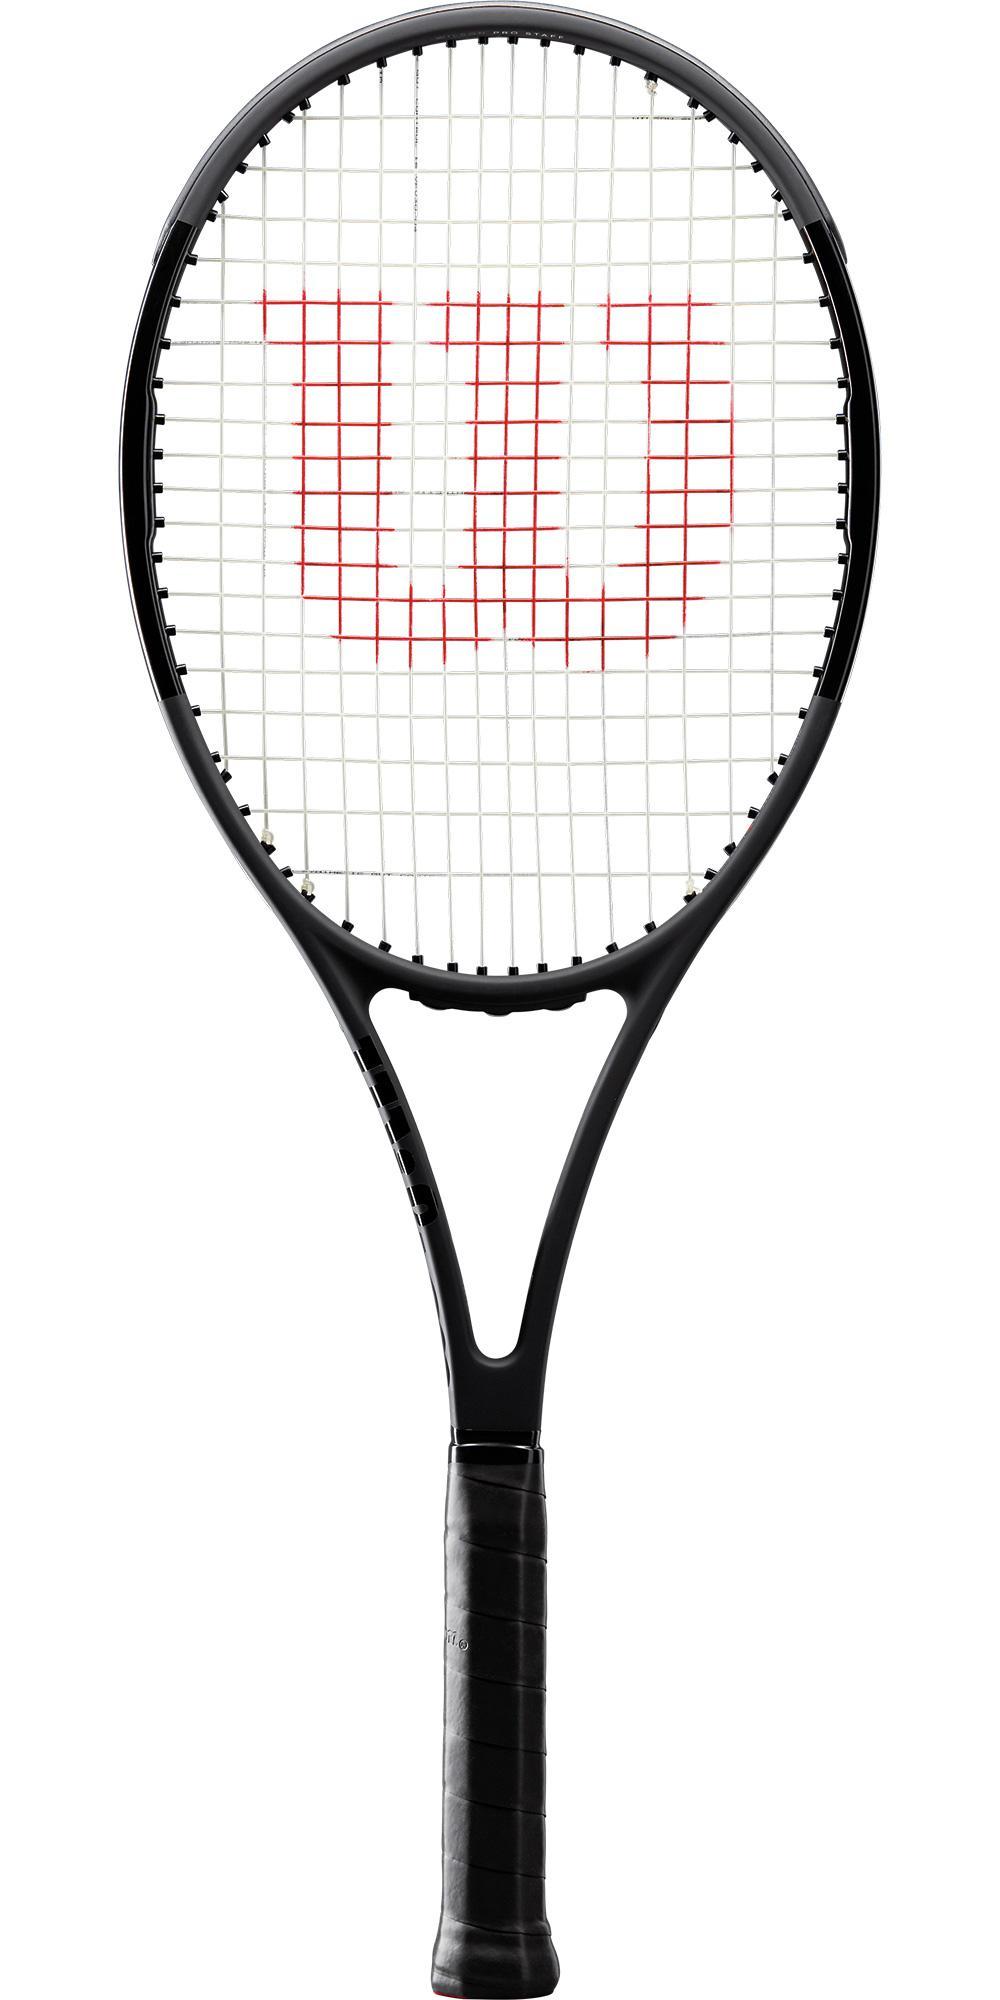 8677c7509 Wilson Pro Staff 97 Countervail Tennis Racket  Frame Only  - Tennisnuts.com